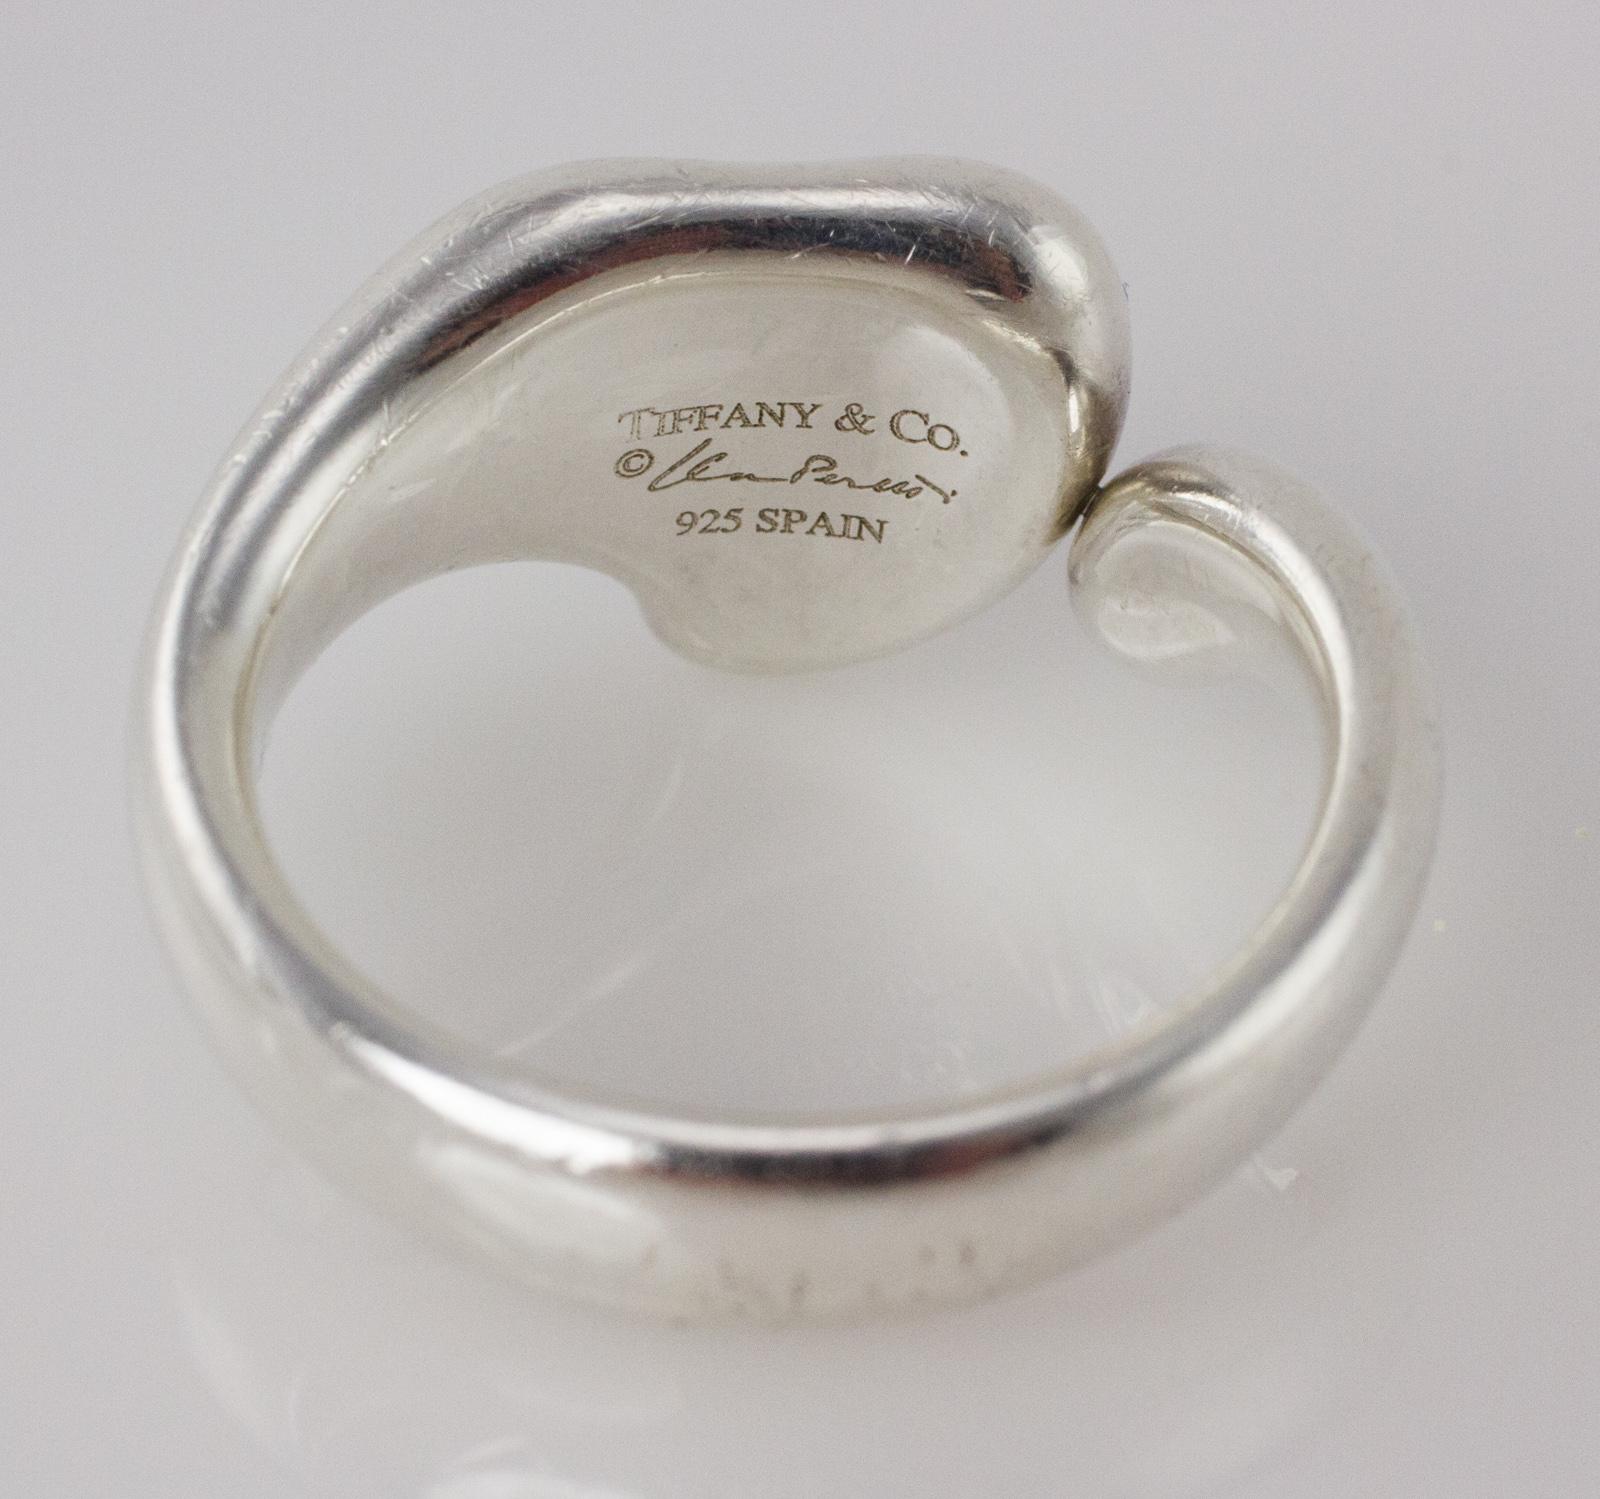 Tiffany Co Elsa Perritti Heart Ring Sterling Silver Penny